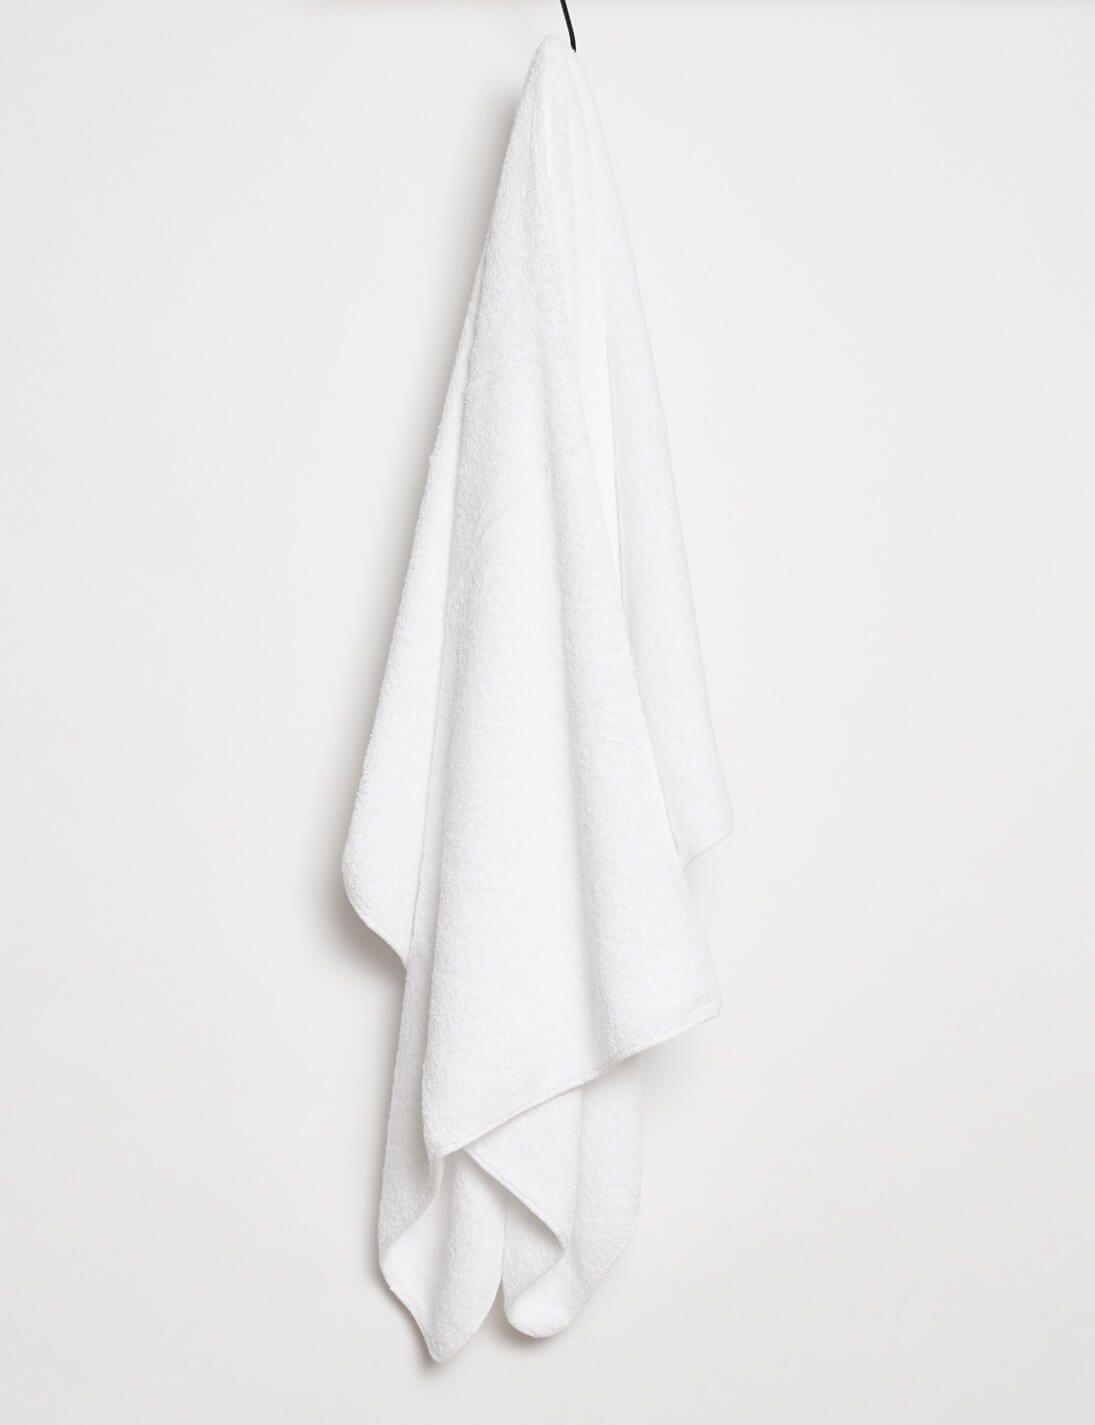 est living design directory abode living primo towel 700.01